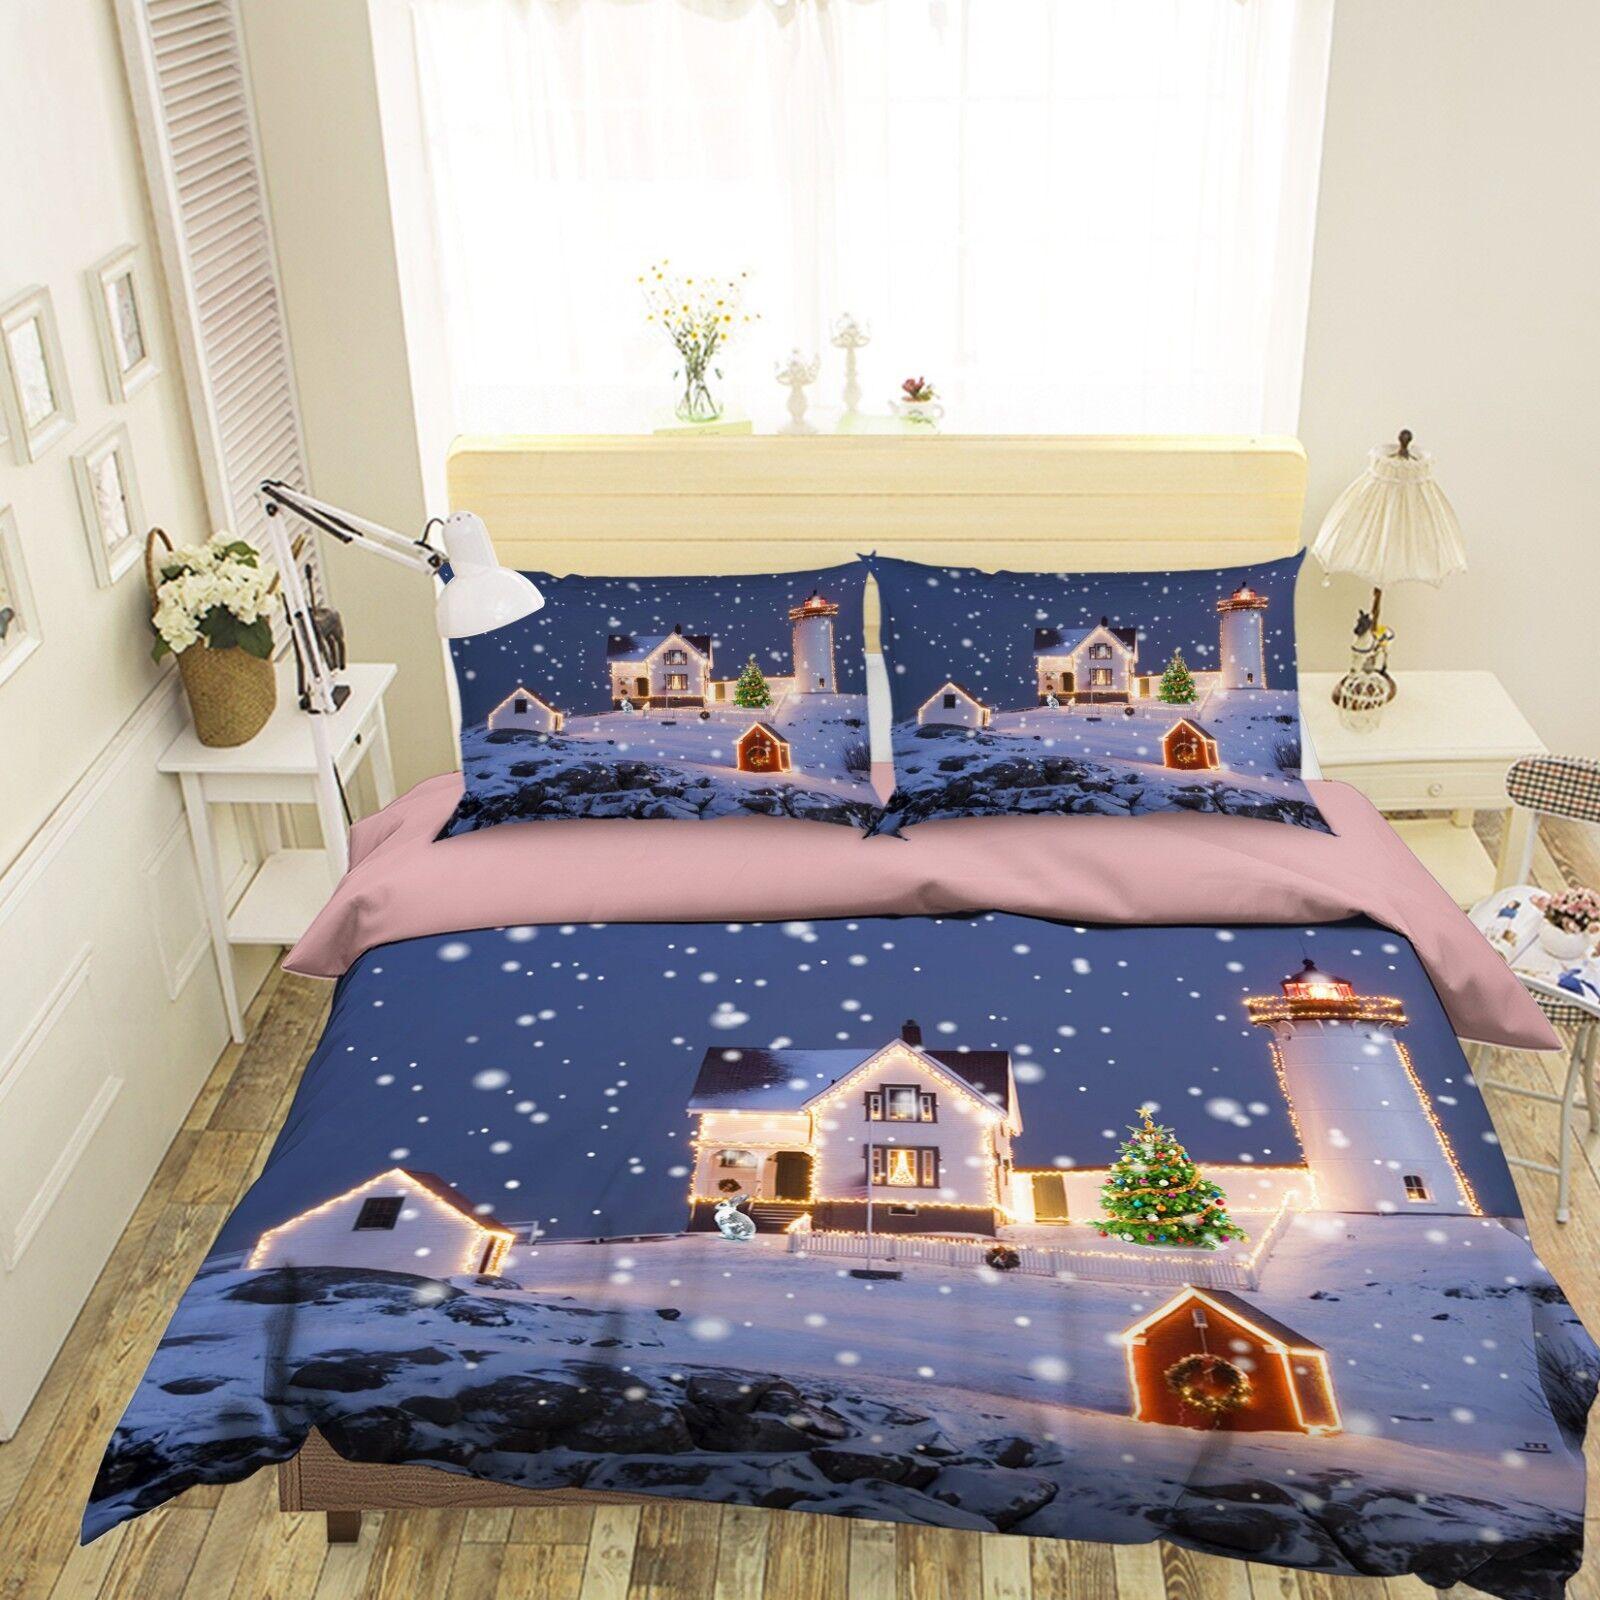 3D Christmas Xmas Snow 499 Bed Pillowcases Quilt Duvet Cover Set Single KingUK